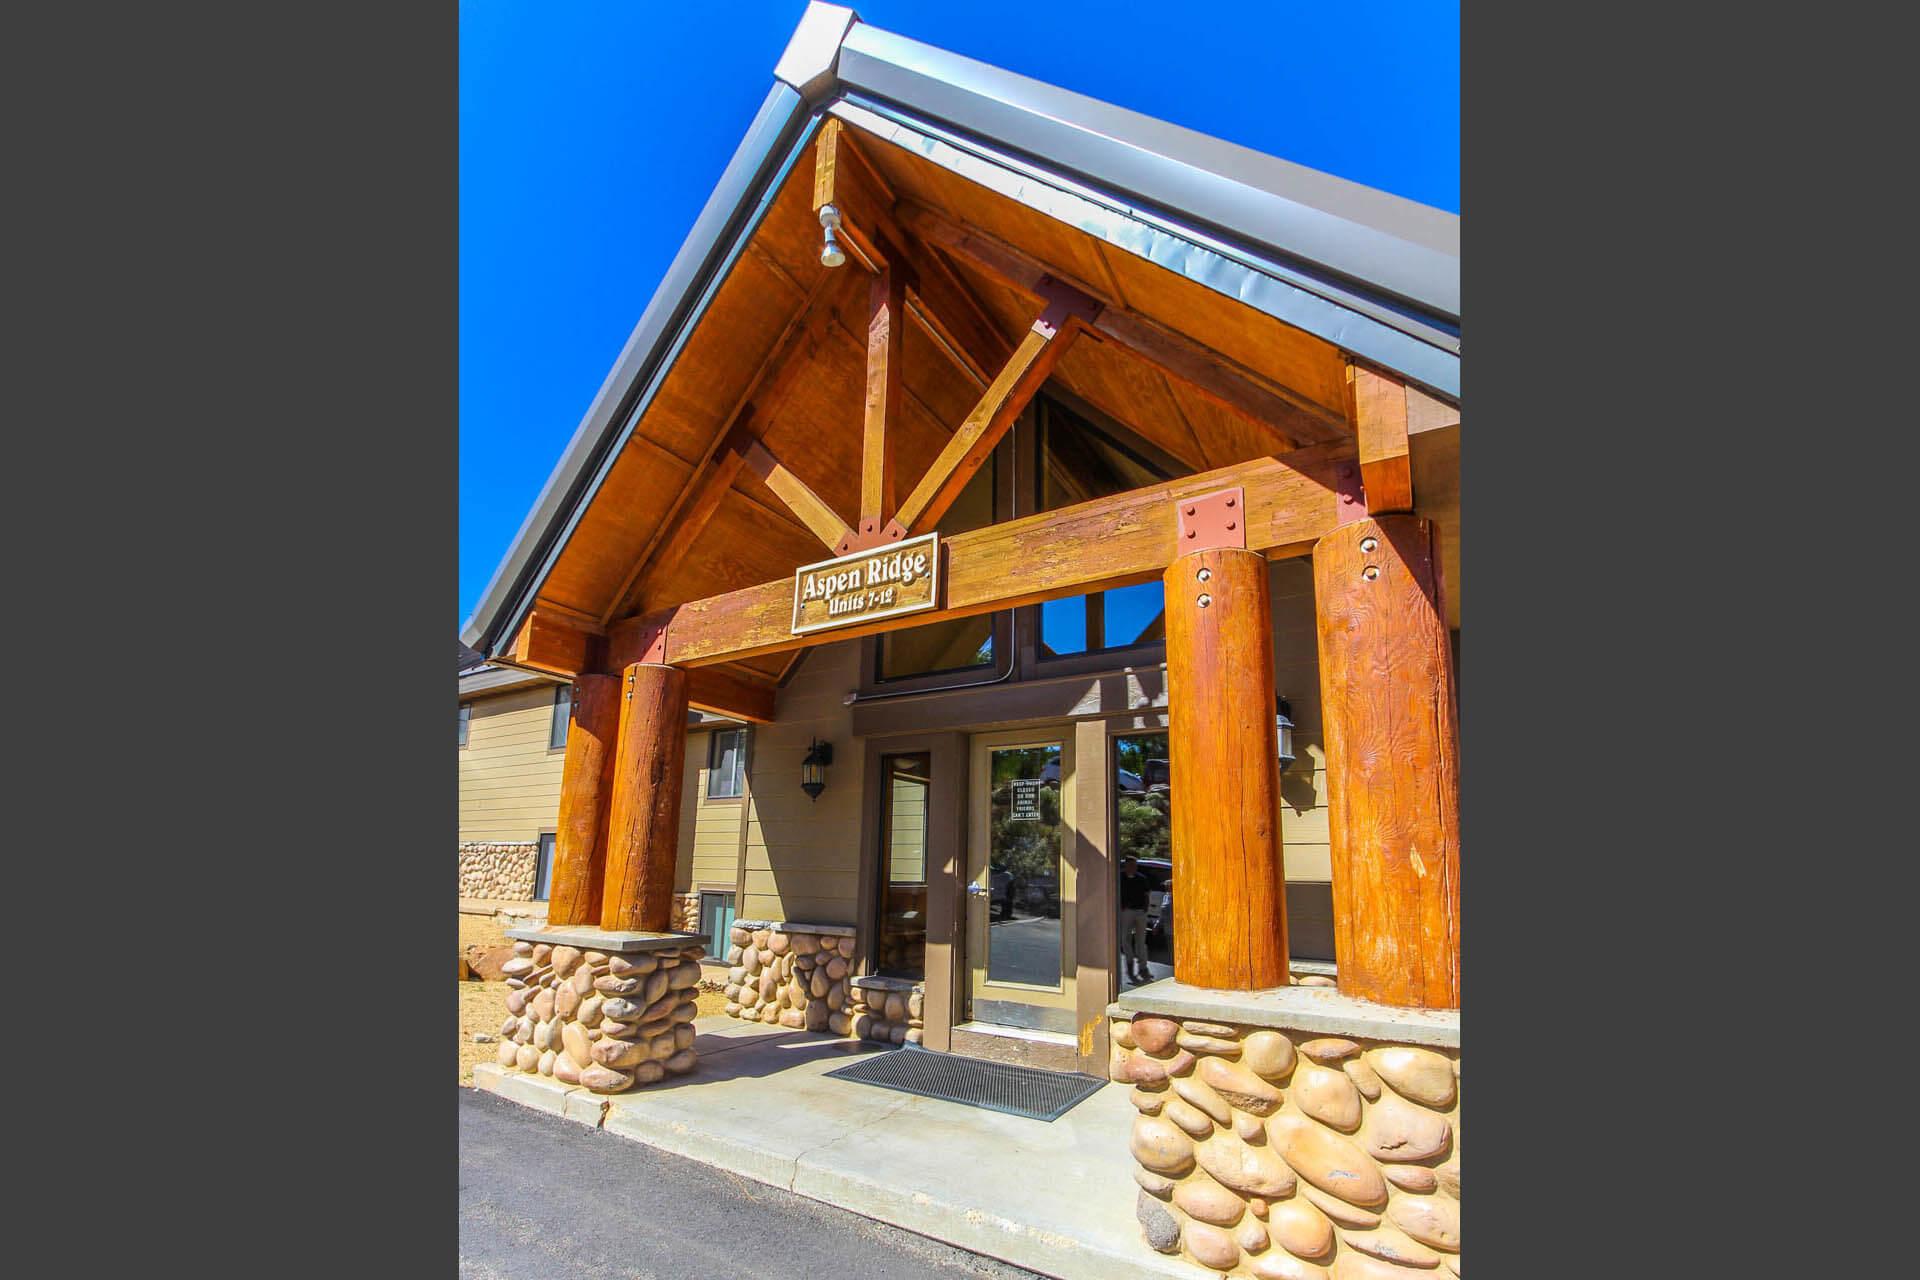 Powder Ridge Villiage Lobby Entrance